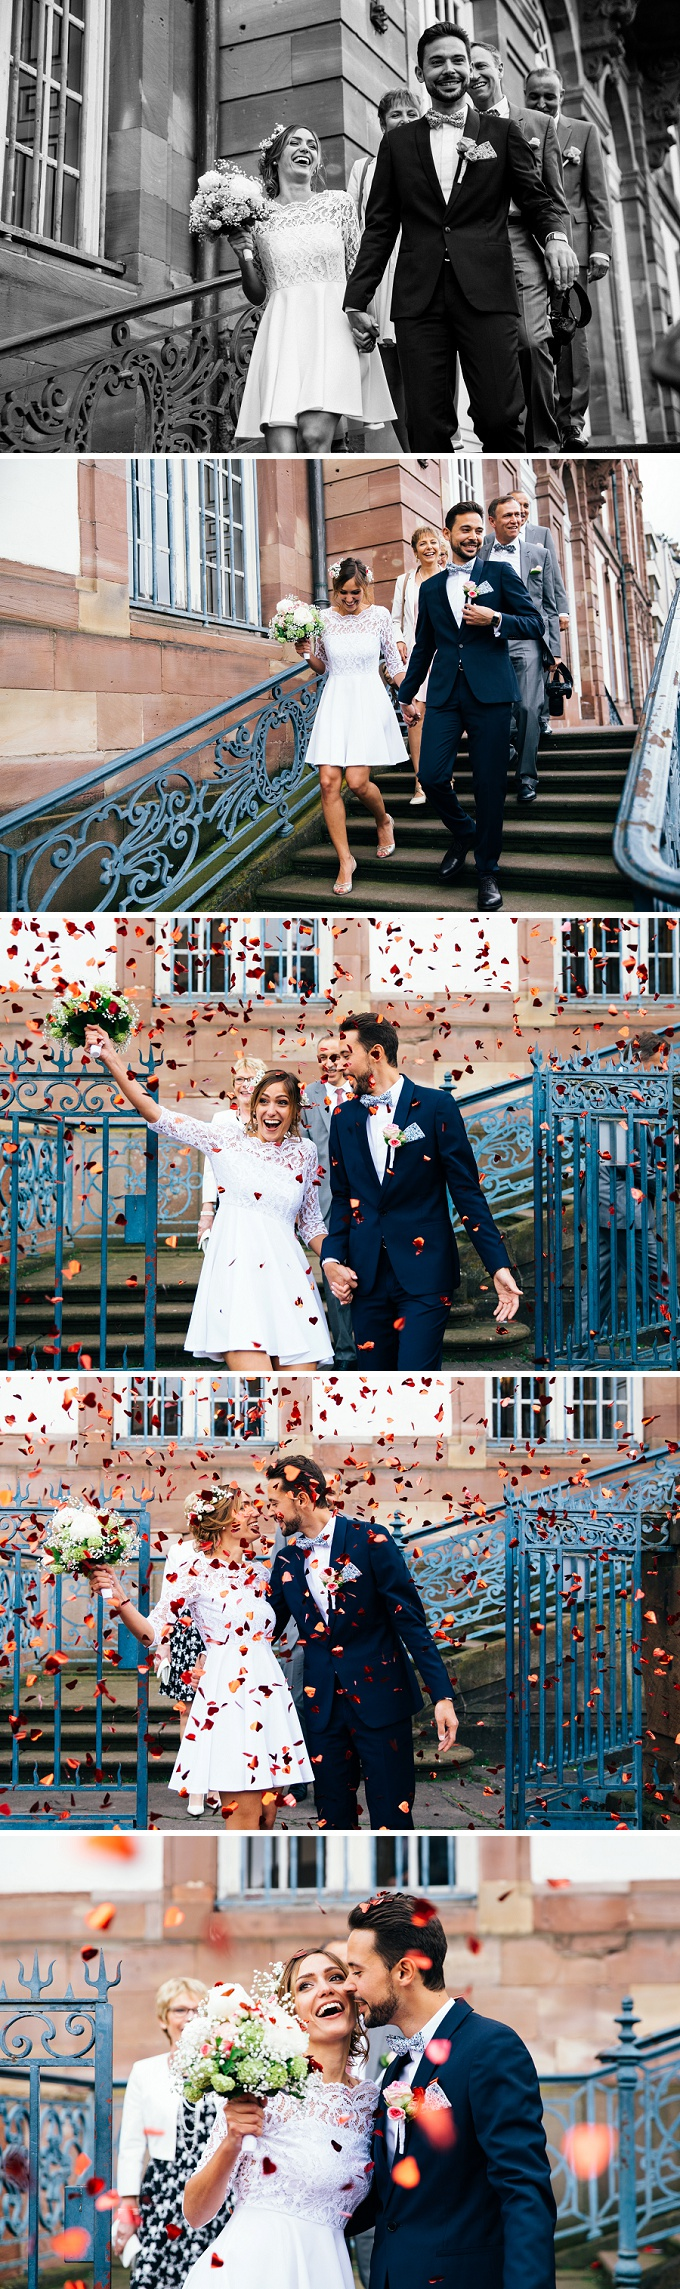 mariage-chateau-dosthoffen-008.jpg